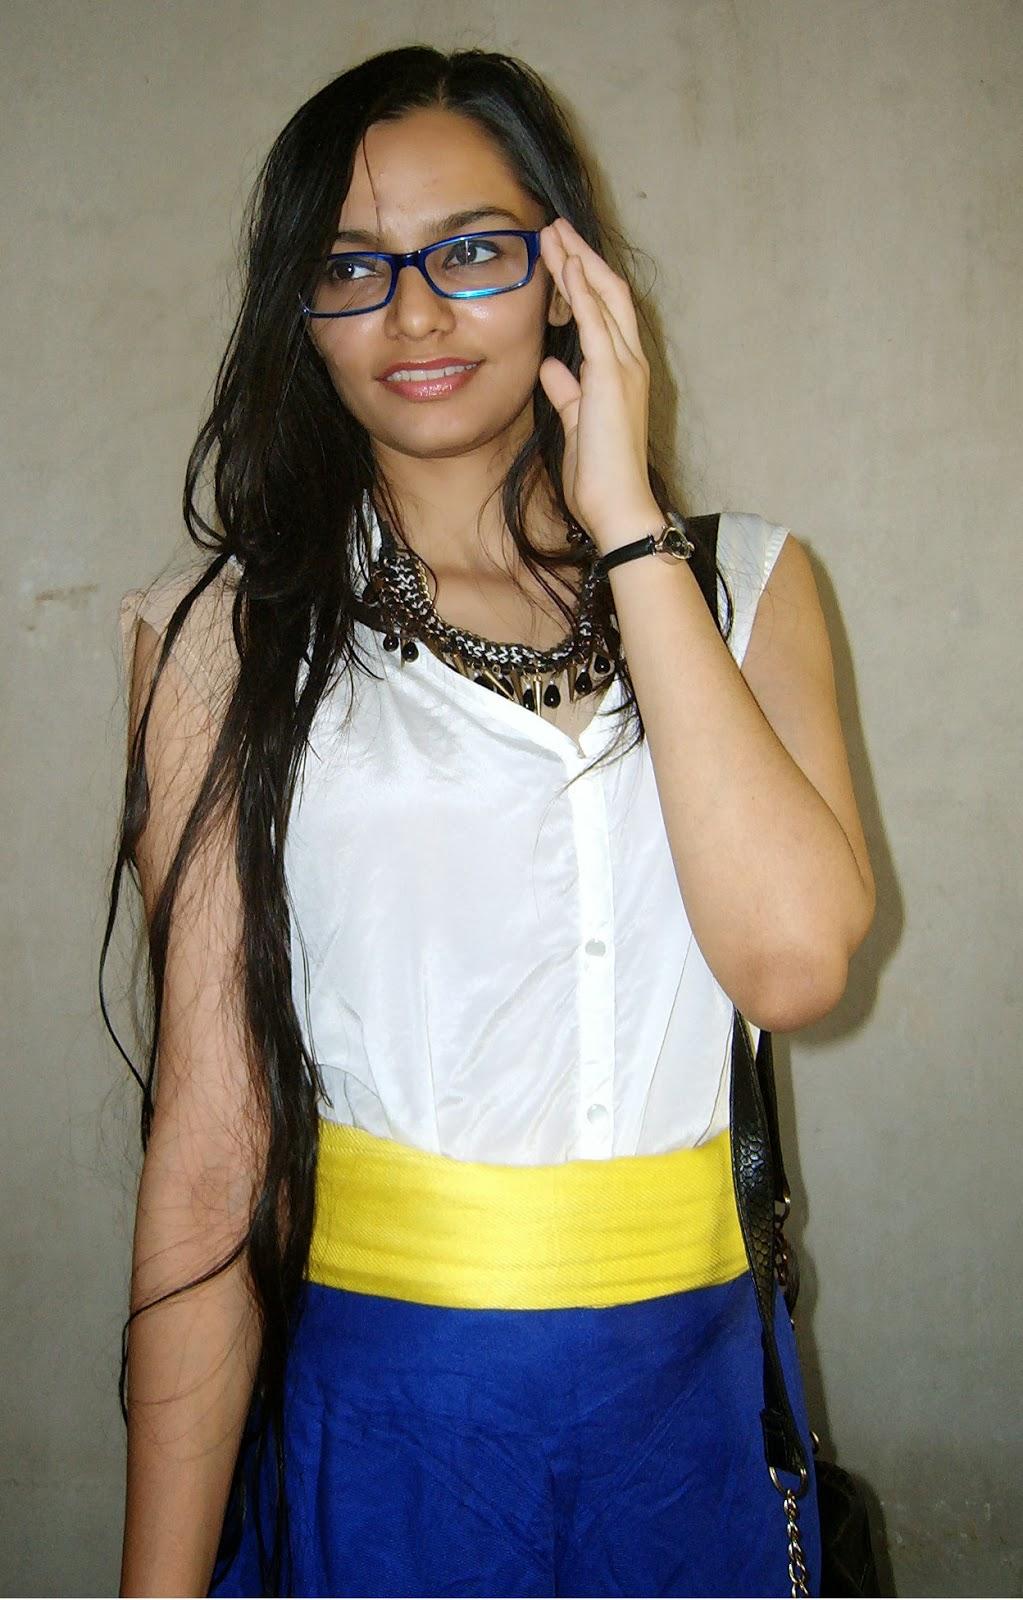 geek chic, mumbai streetstyle, how to wear statement necklaces, blue glasses, mumbai fashion blogger